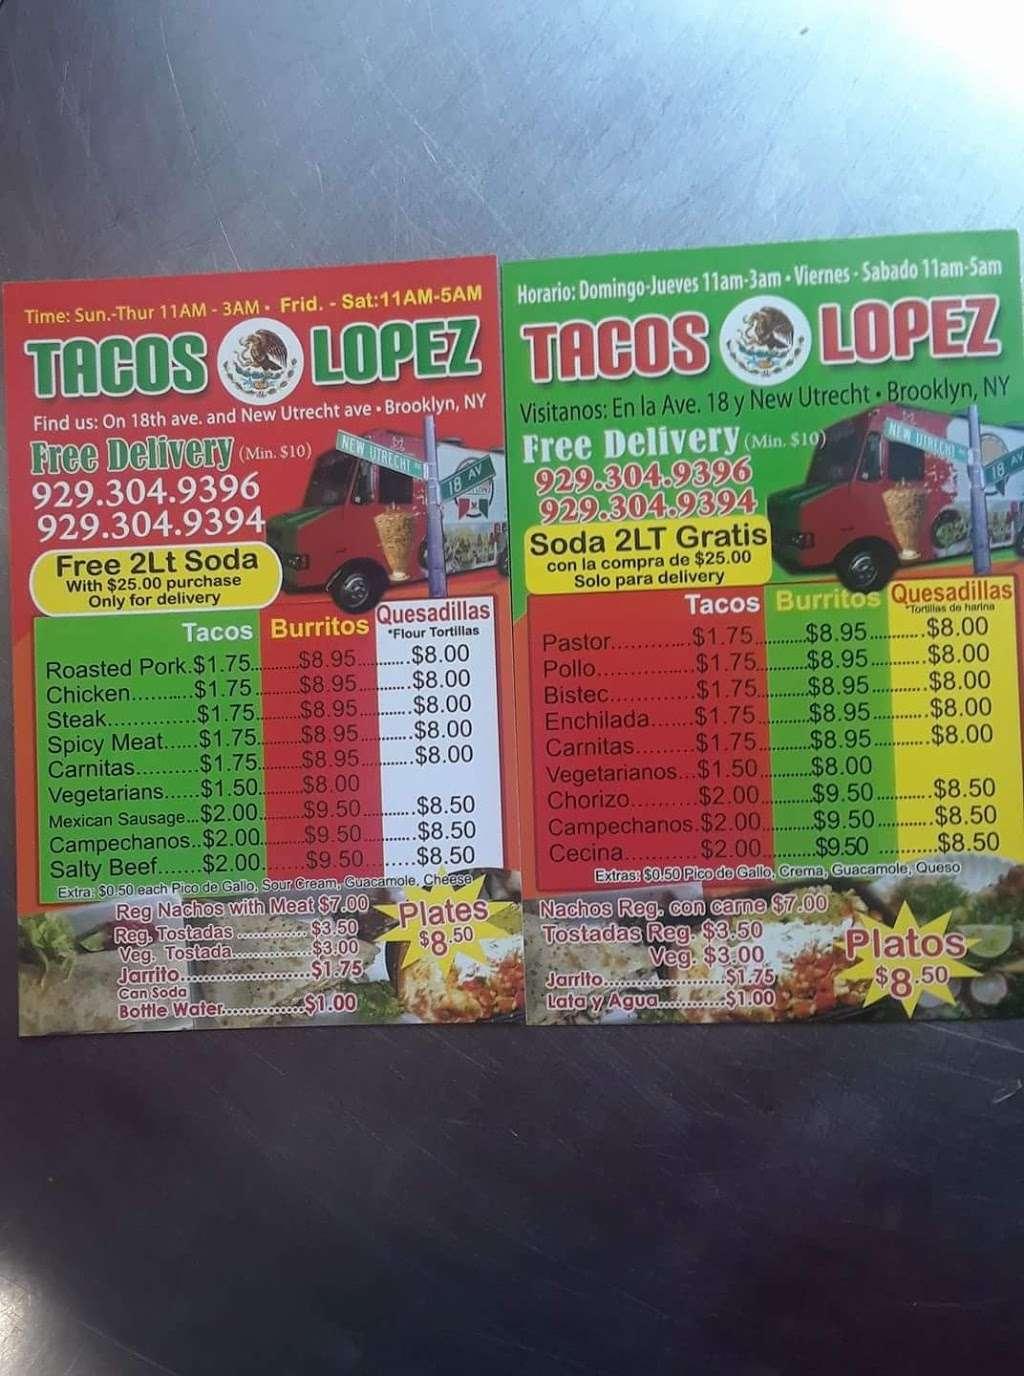 Taco LOPEZ - restaurant    Photo 8 of 10   Address: 86th street and, 18th Ave, Brooklyn, NY 11214, USA   Phone: (929) 304-9394